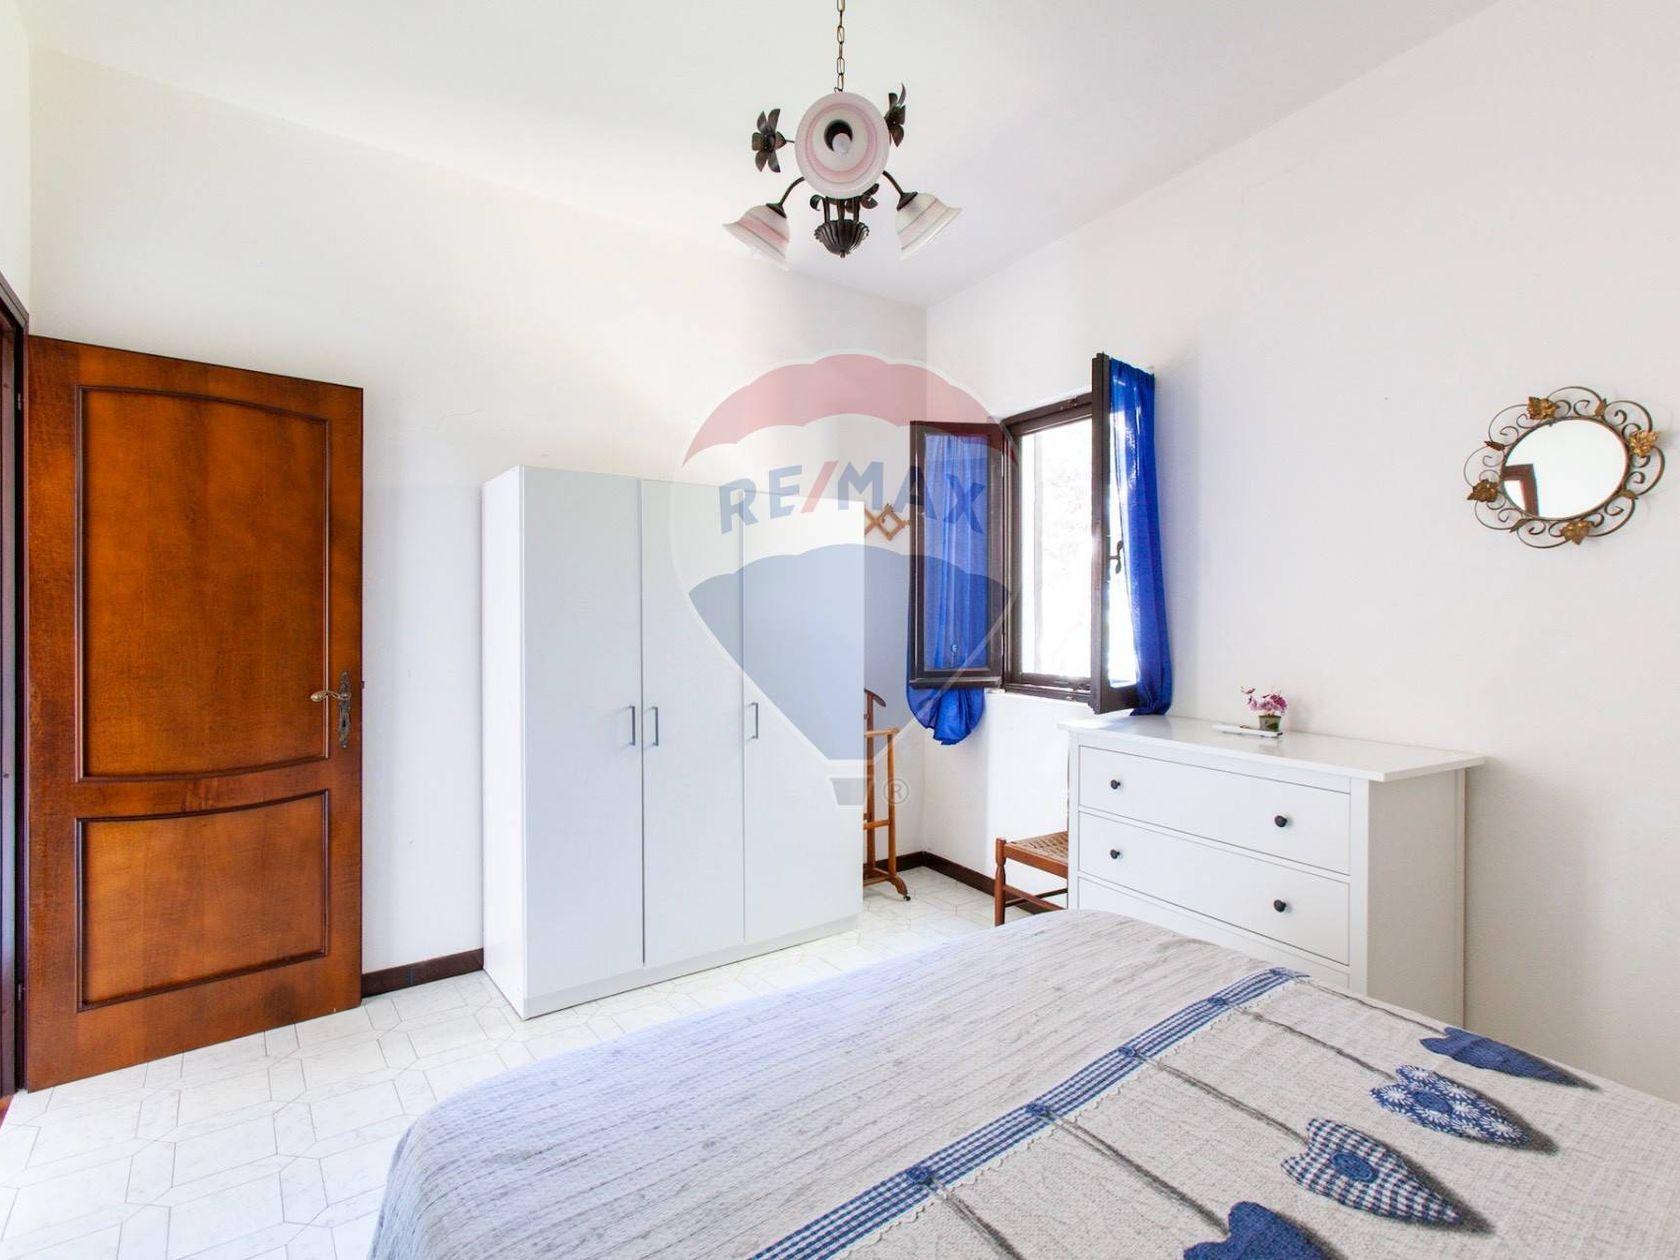 Villa singola Zona Santa Margherita, Pula, CA Vendita - Foto 42